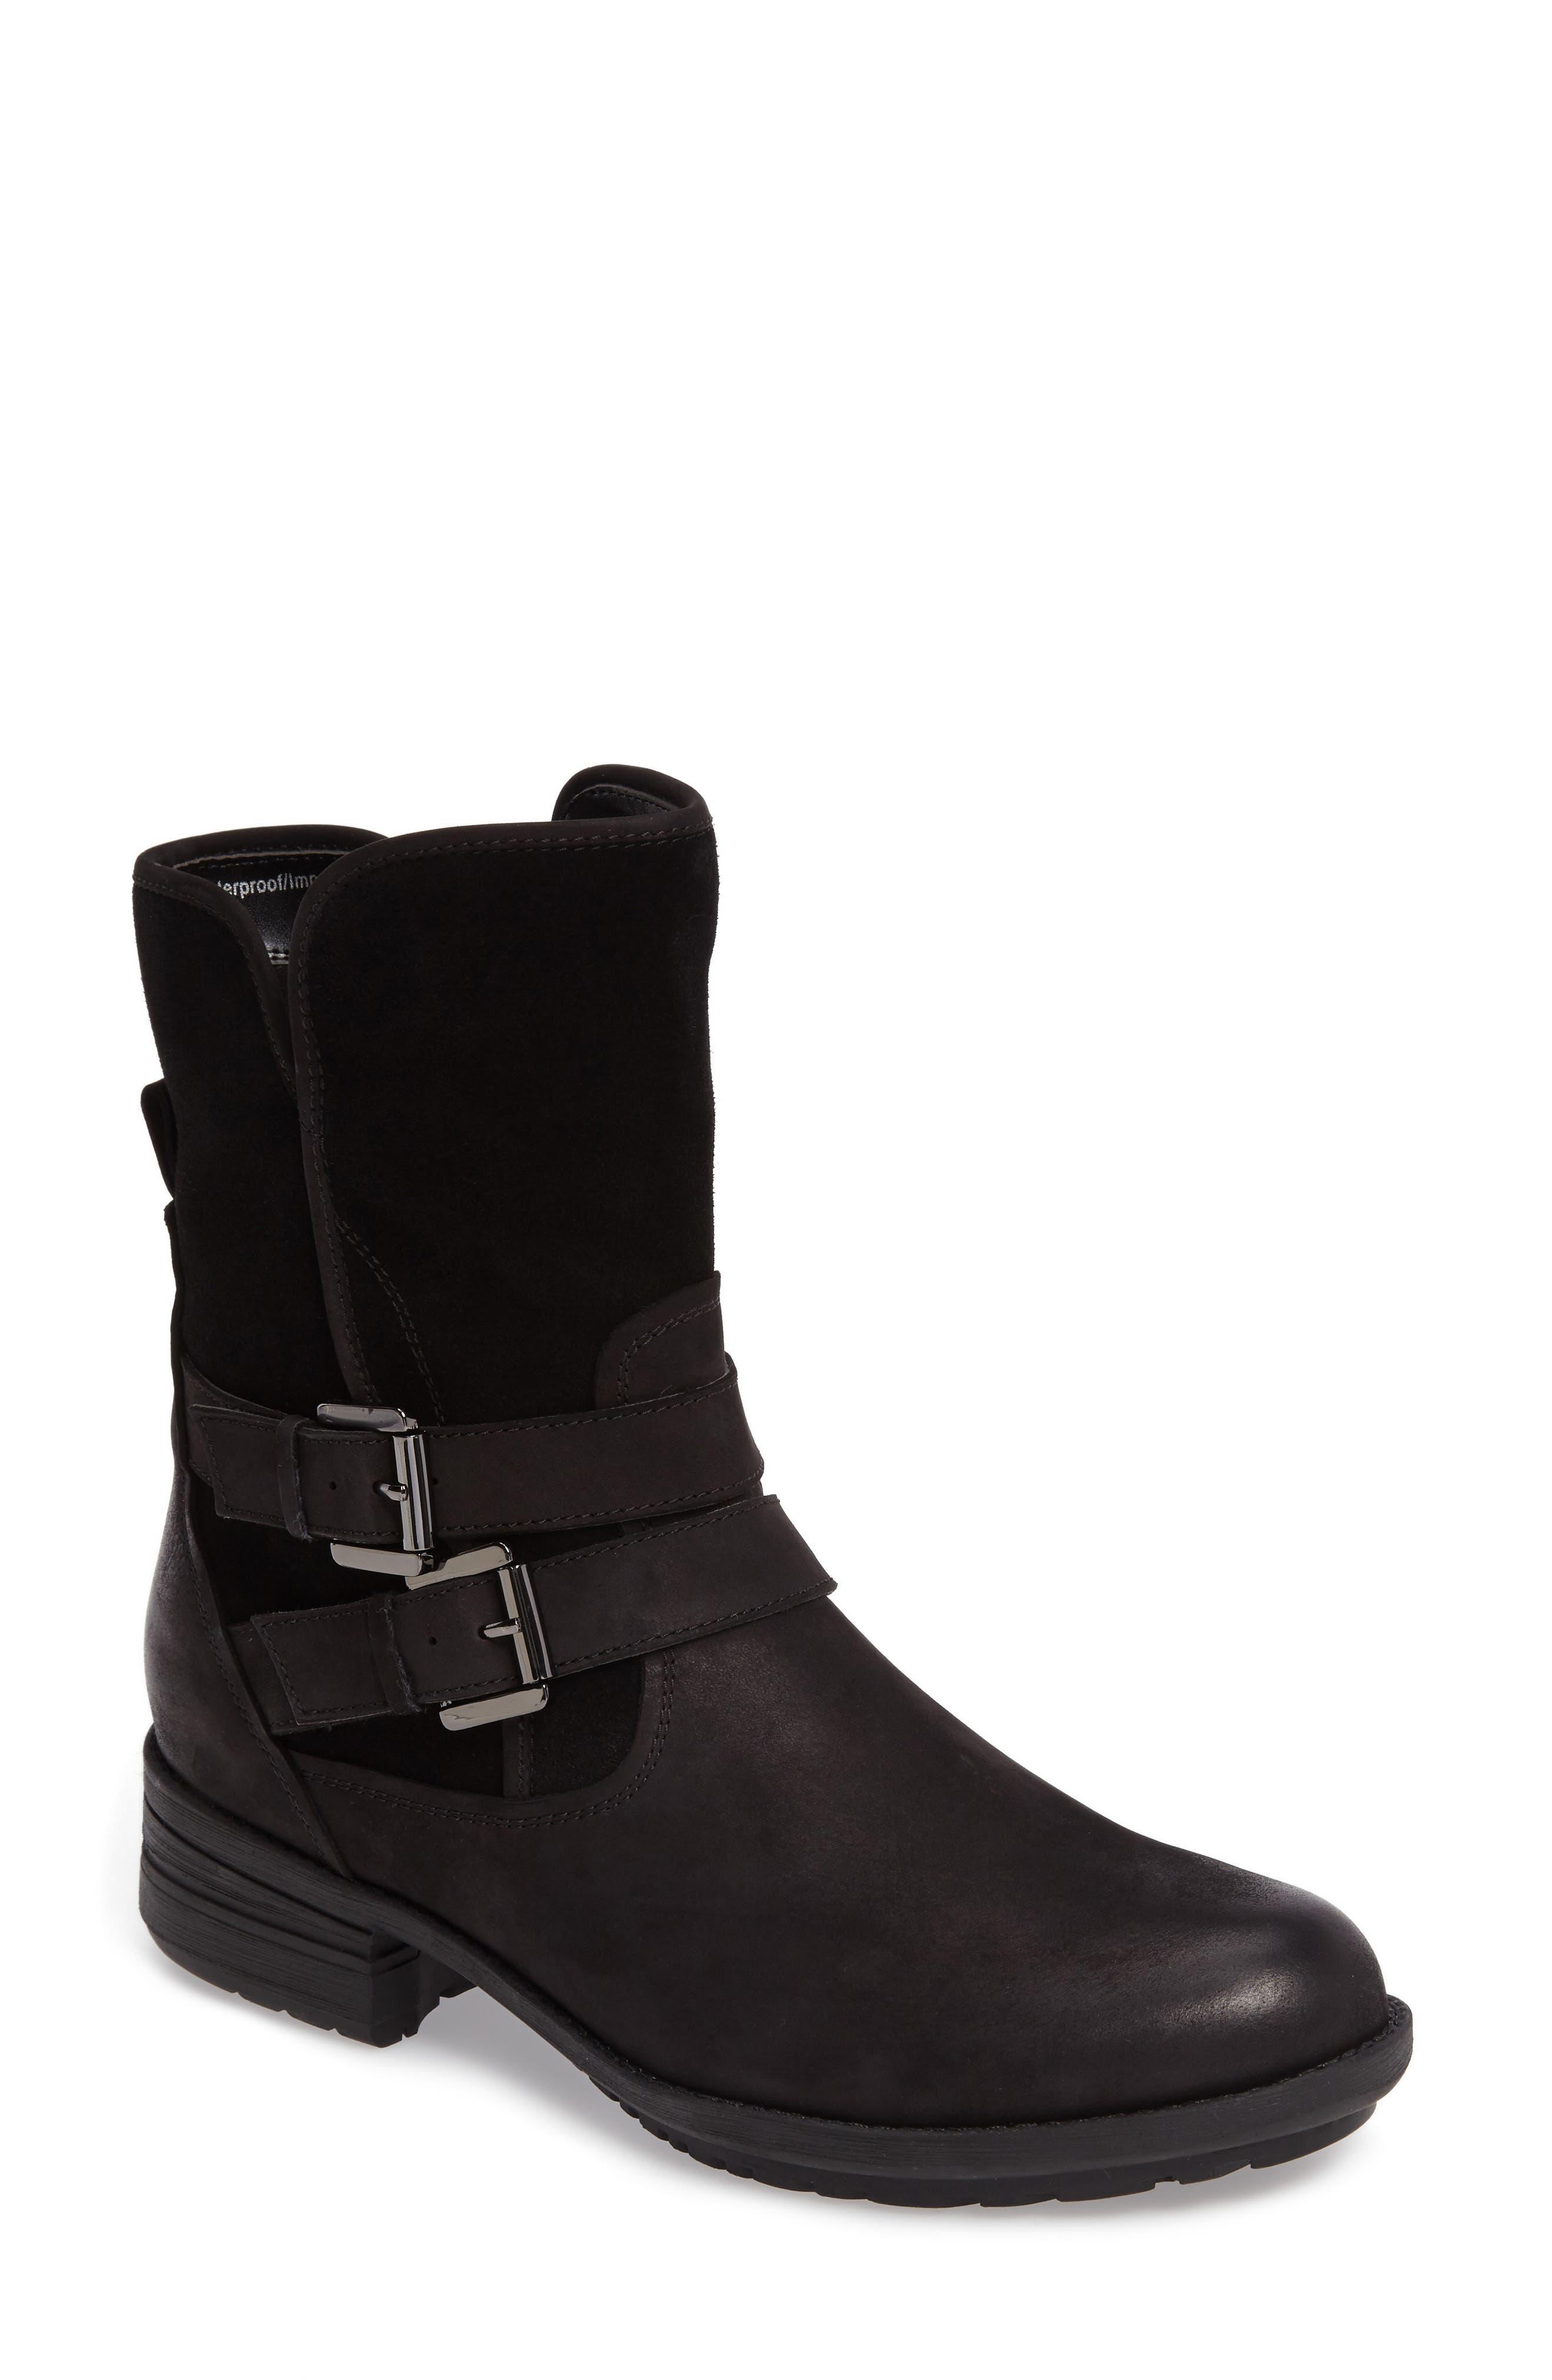 Tula Waterproof Boot,                             Main thumbnail 1, color,                             Black Nubuck Leather